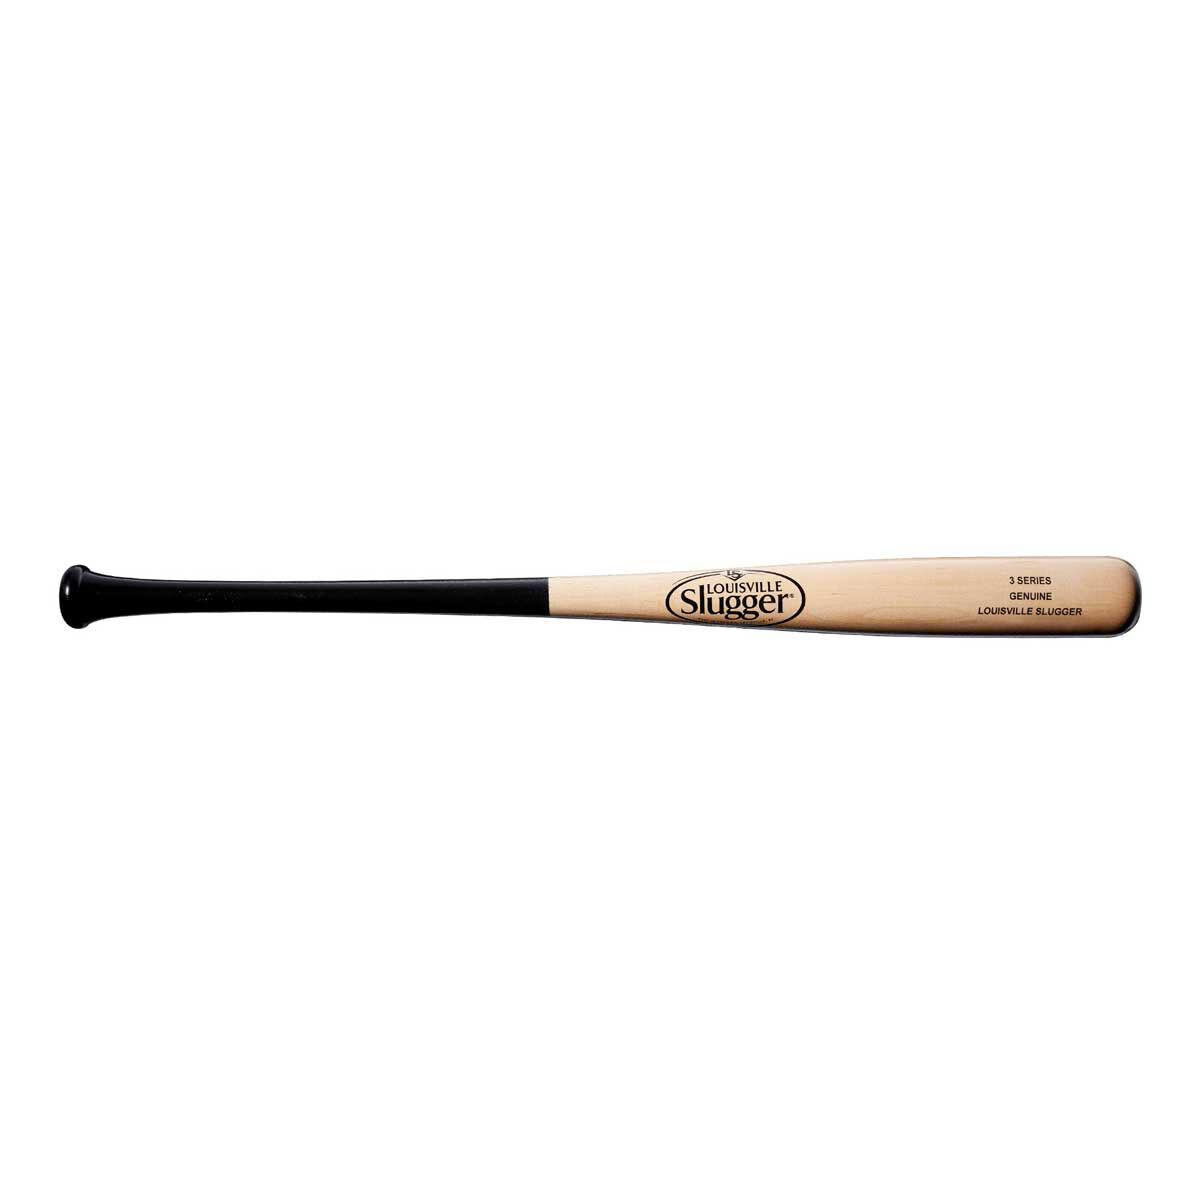 Louisville Slugger Genuine Series 3 Ash Mix Baseball Bat